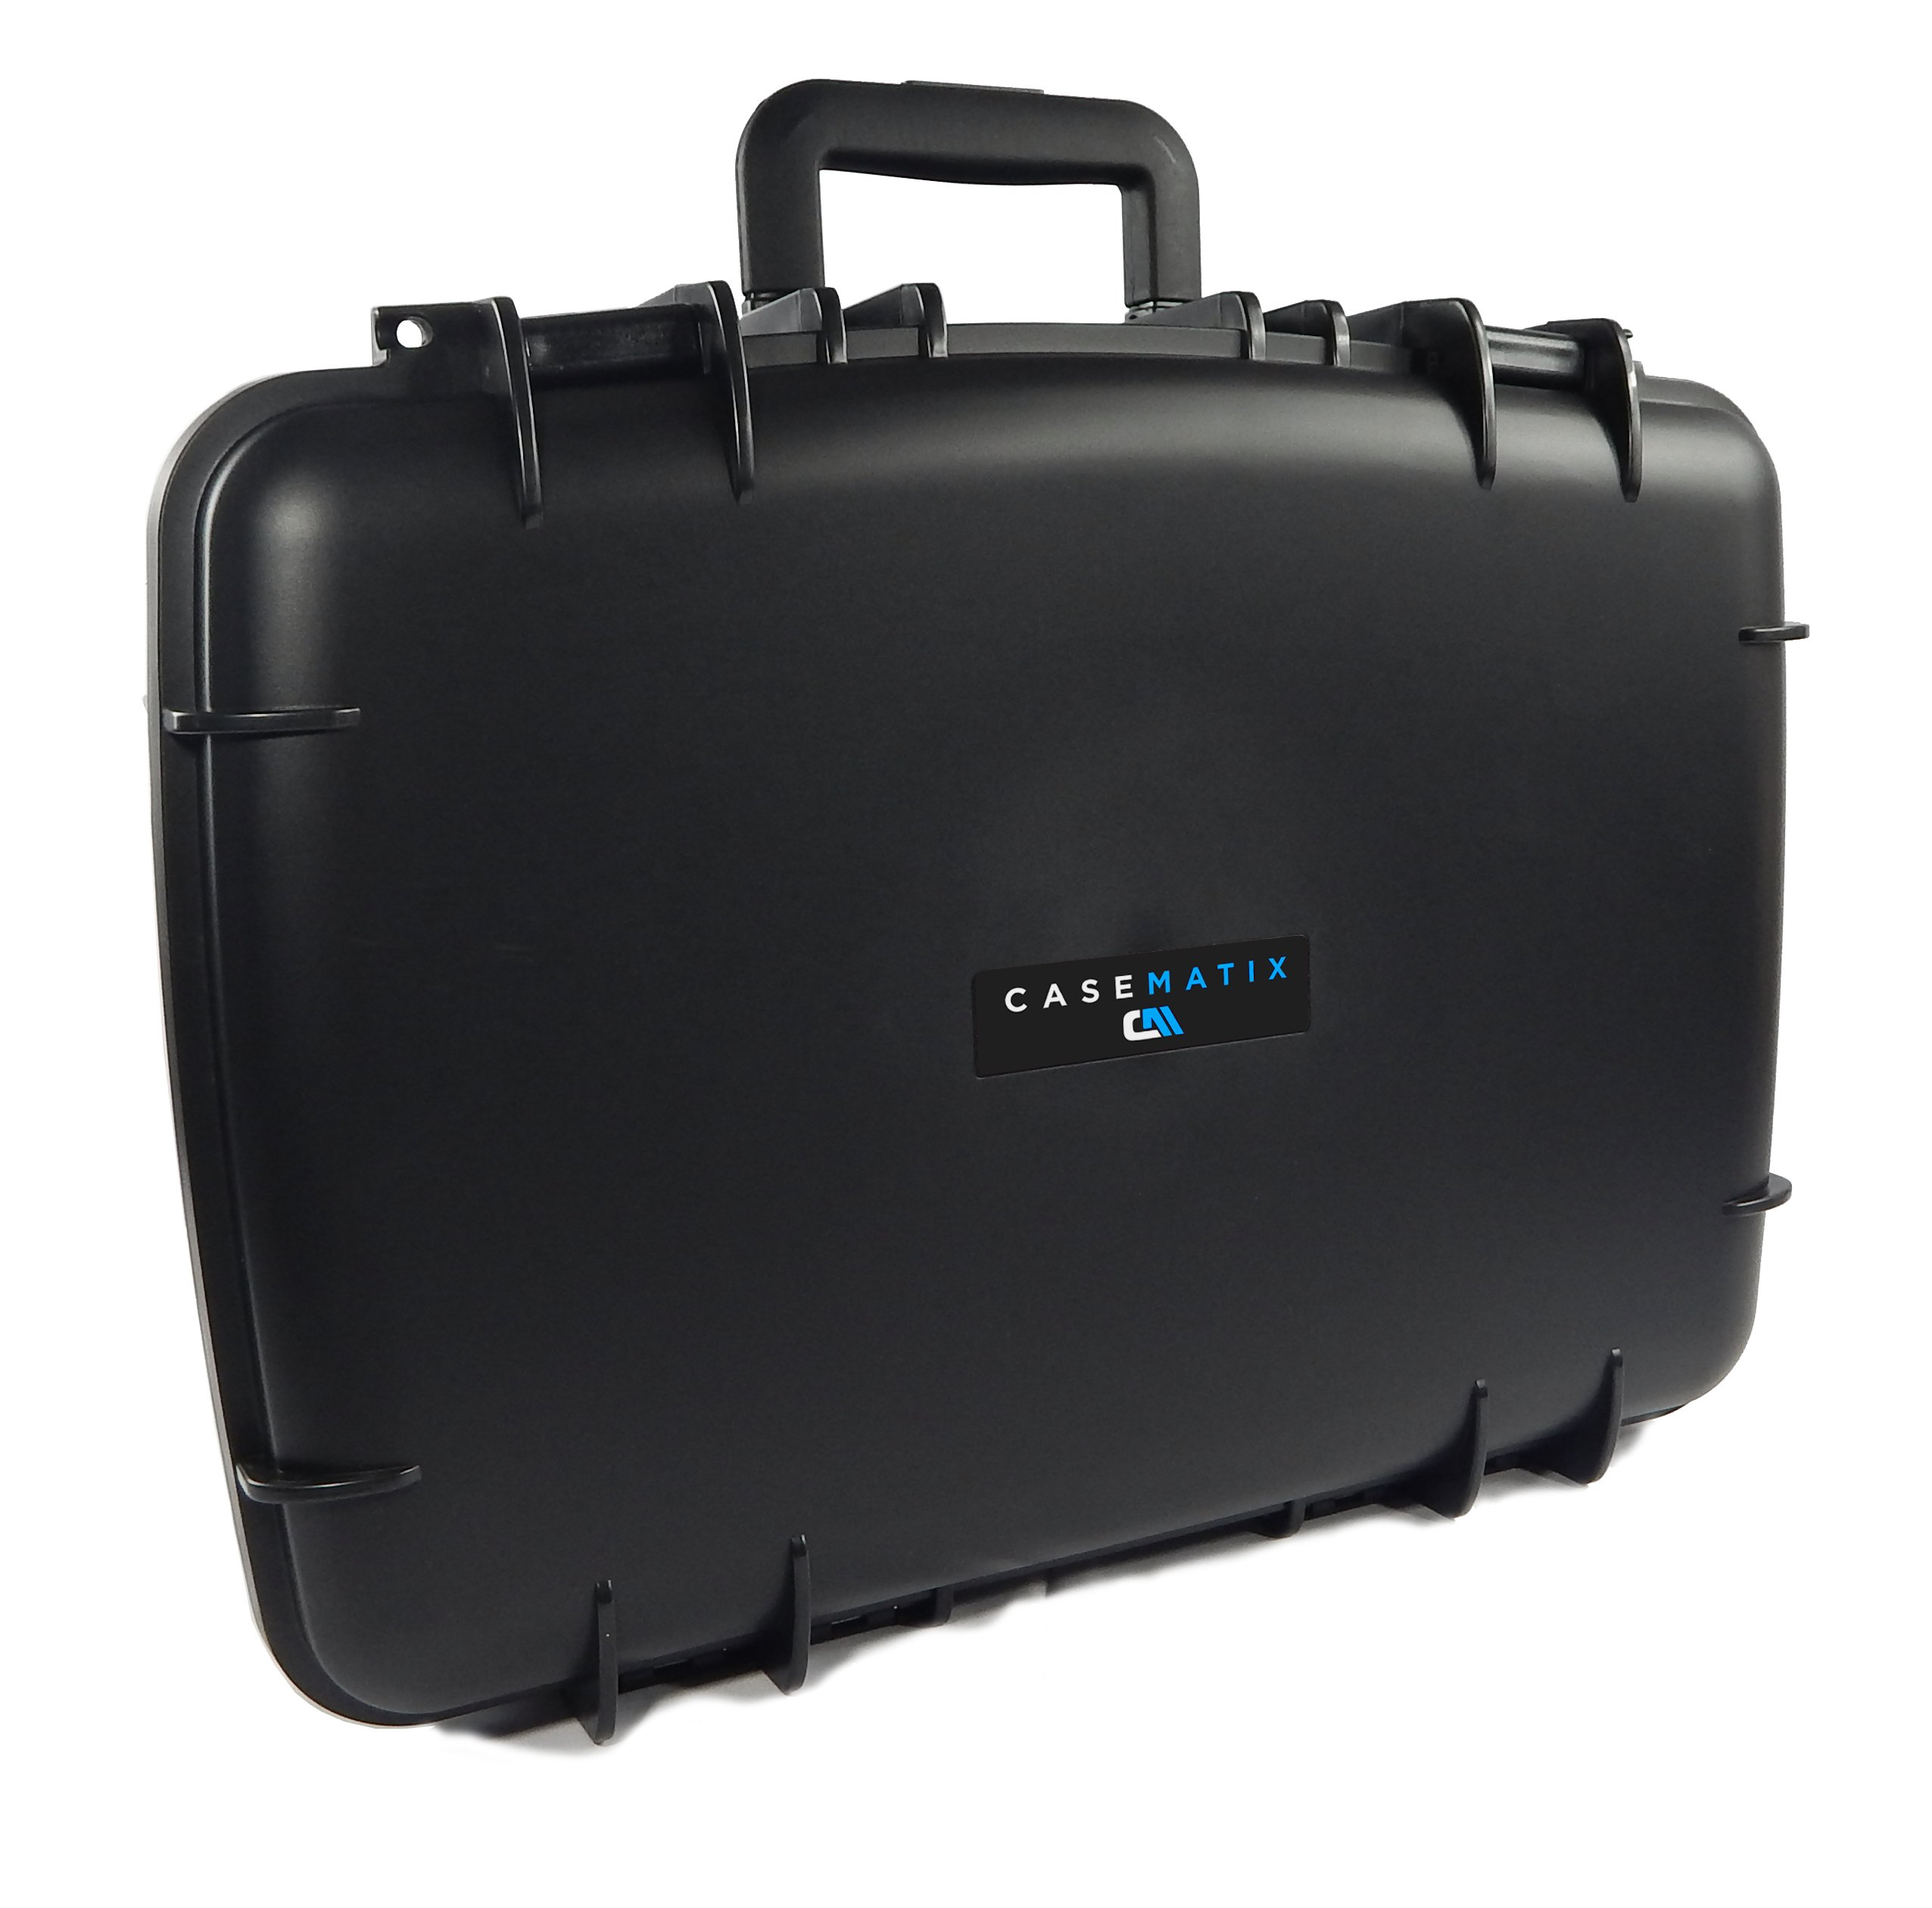 CASEMATIX ArmorXL Travel Carrying Case (22'') for DJ Controller or Mixer and Accessories - Fits Gemini SLATE 2-Channel Serato Dj Intro Controller / CDJ-700 / CDJ-650 / CDJ-300